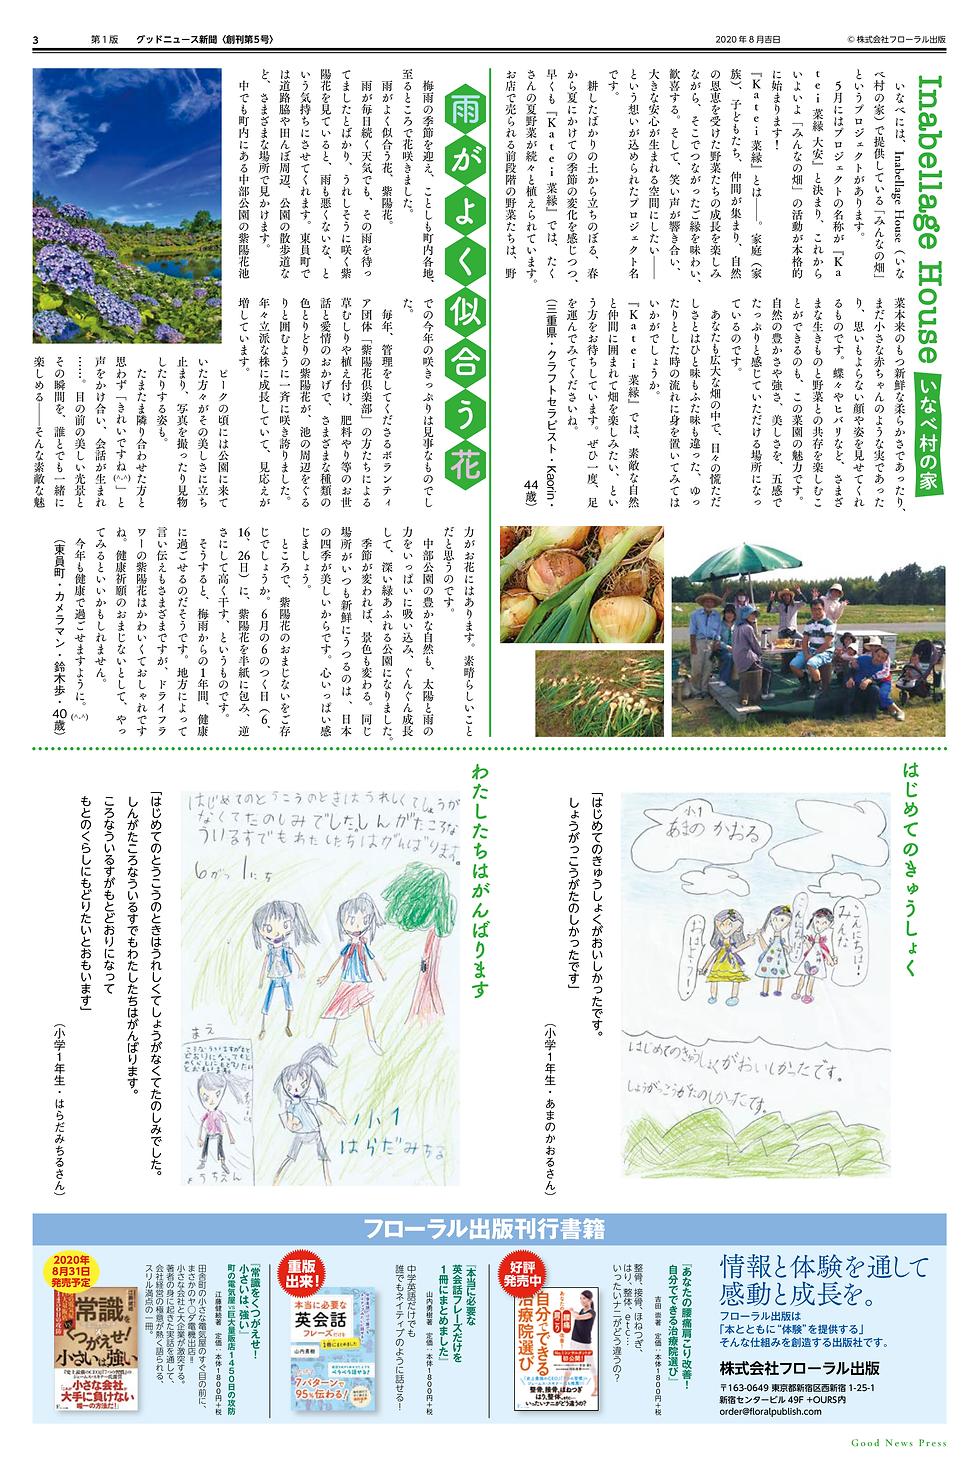 GNP5go_webyo (1)_ページ_3.png